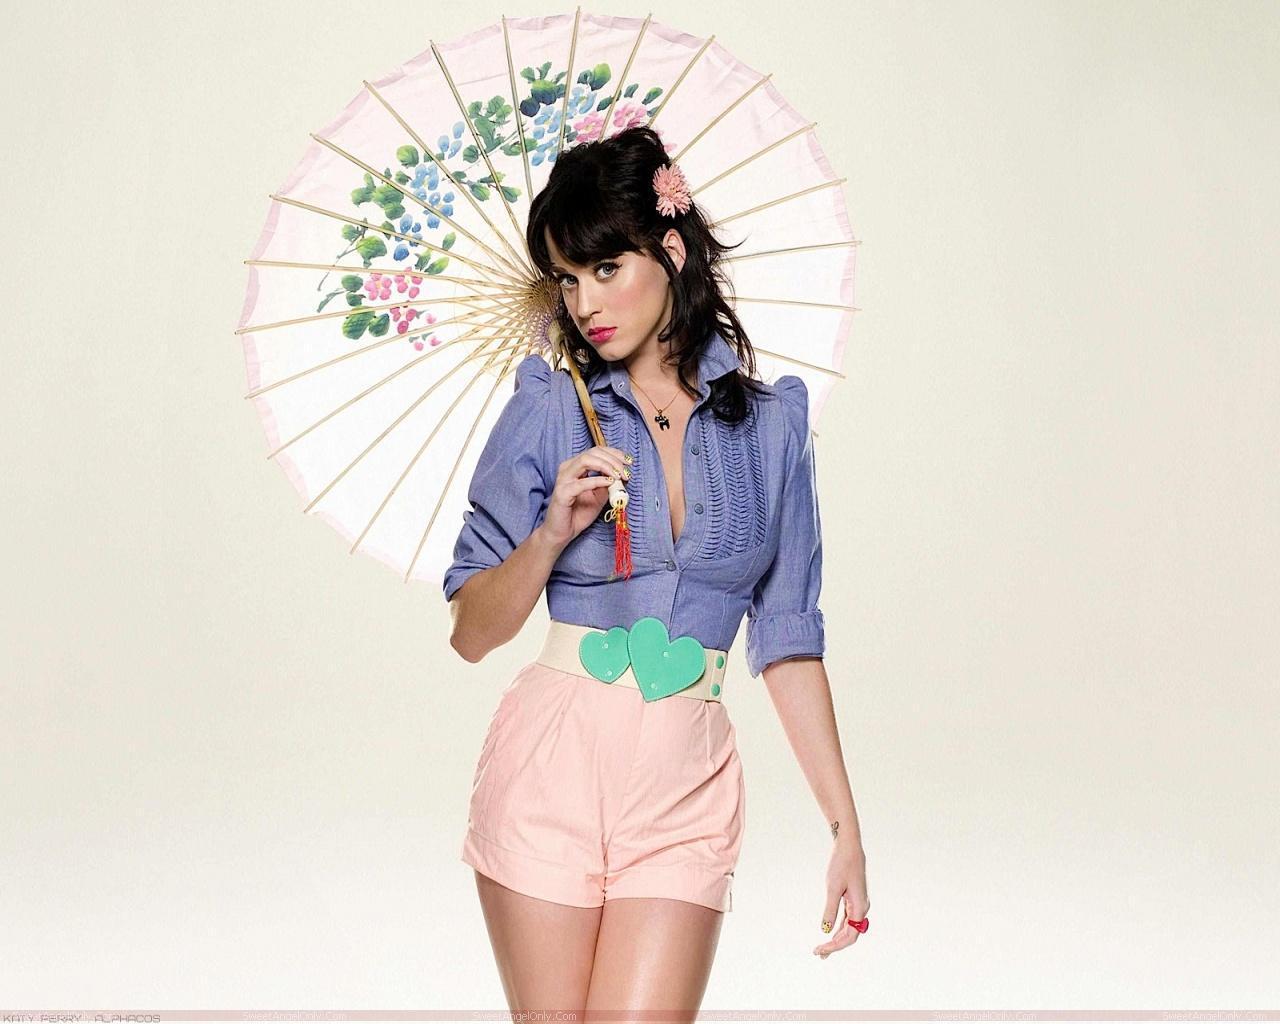 http://3.bp.blogspot.com/-yMKm0RdXsSY/TXeLs0a-6LI/AAAAAAAAFKA/RaYr2B6AfbA/s1600/singer_celebrity_katy_perry_hot_wallpaper_16.jpg